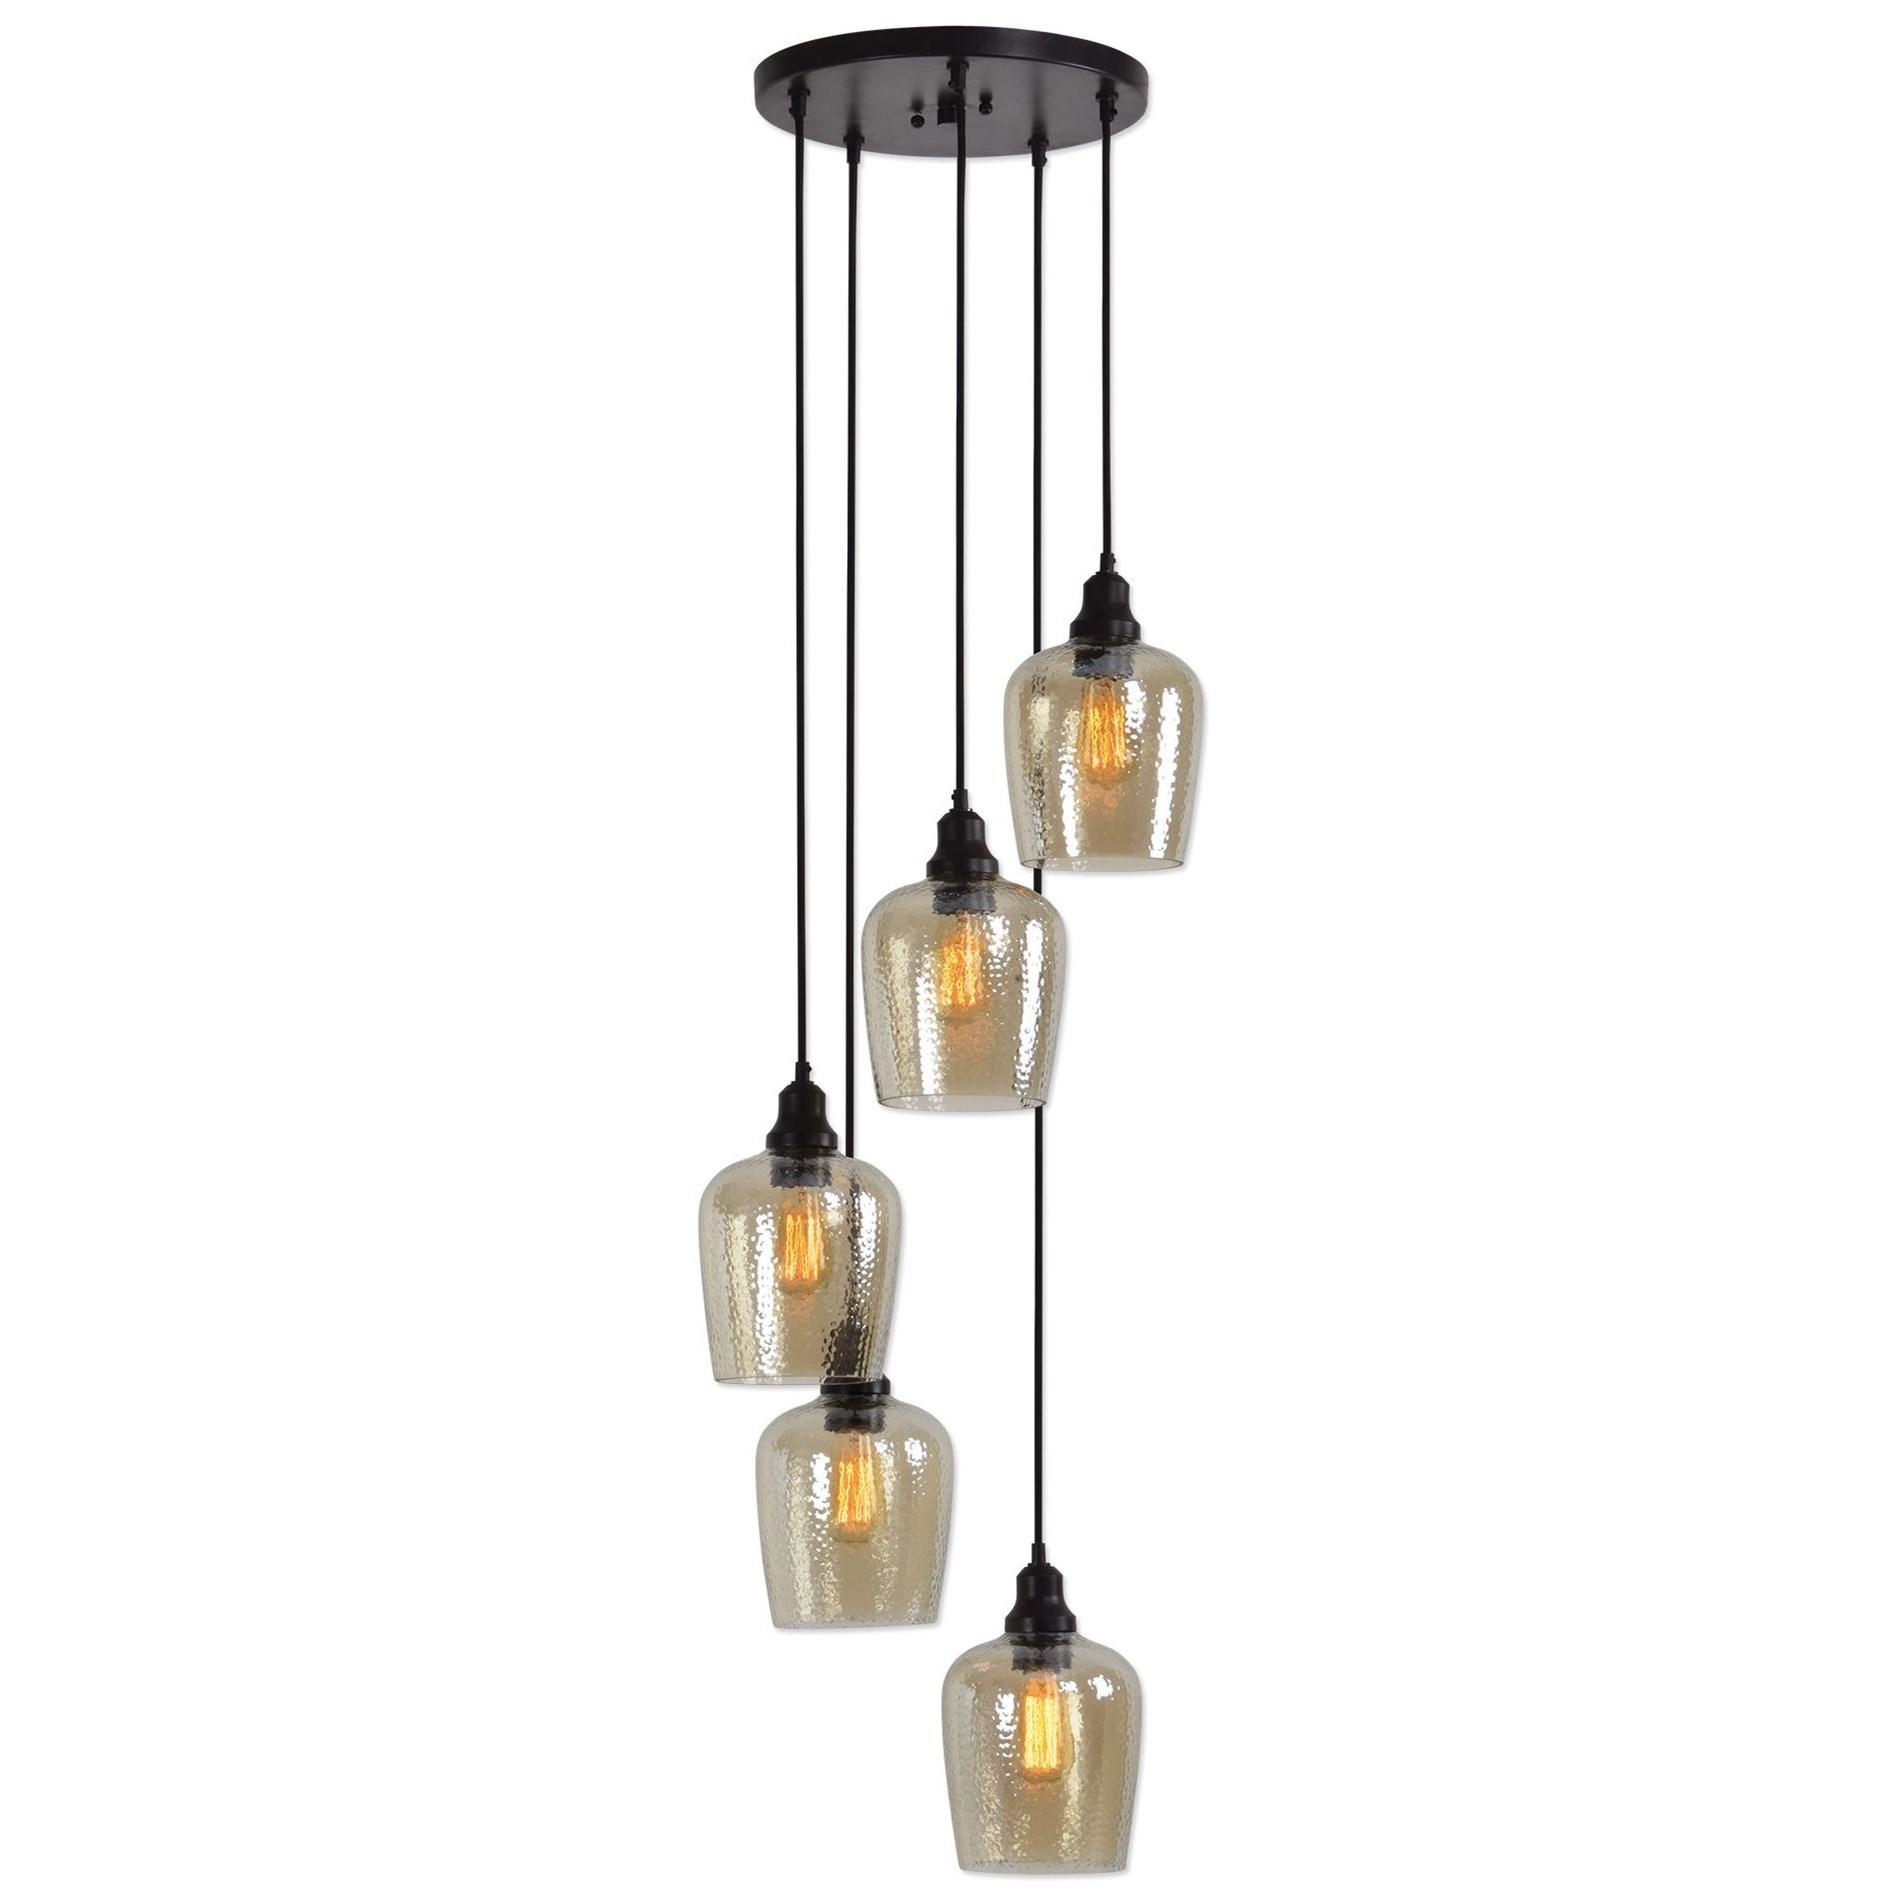 Uttermost Lighting Fixtures Aarush 5 Light Glass Cluster